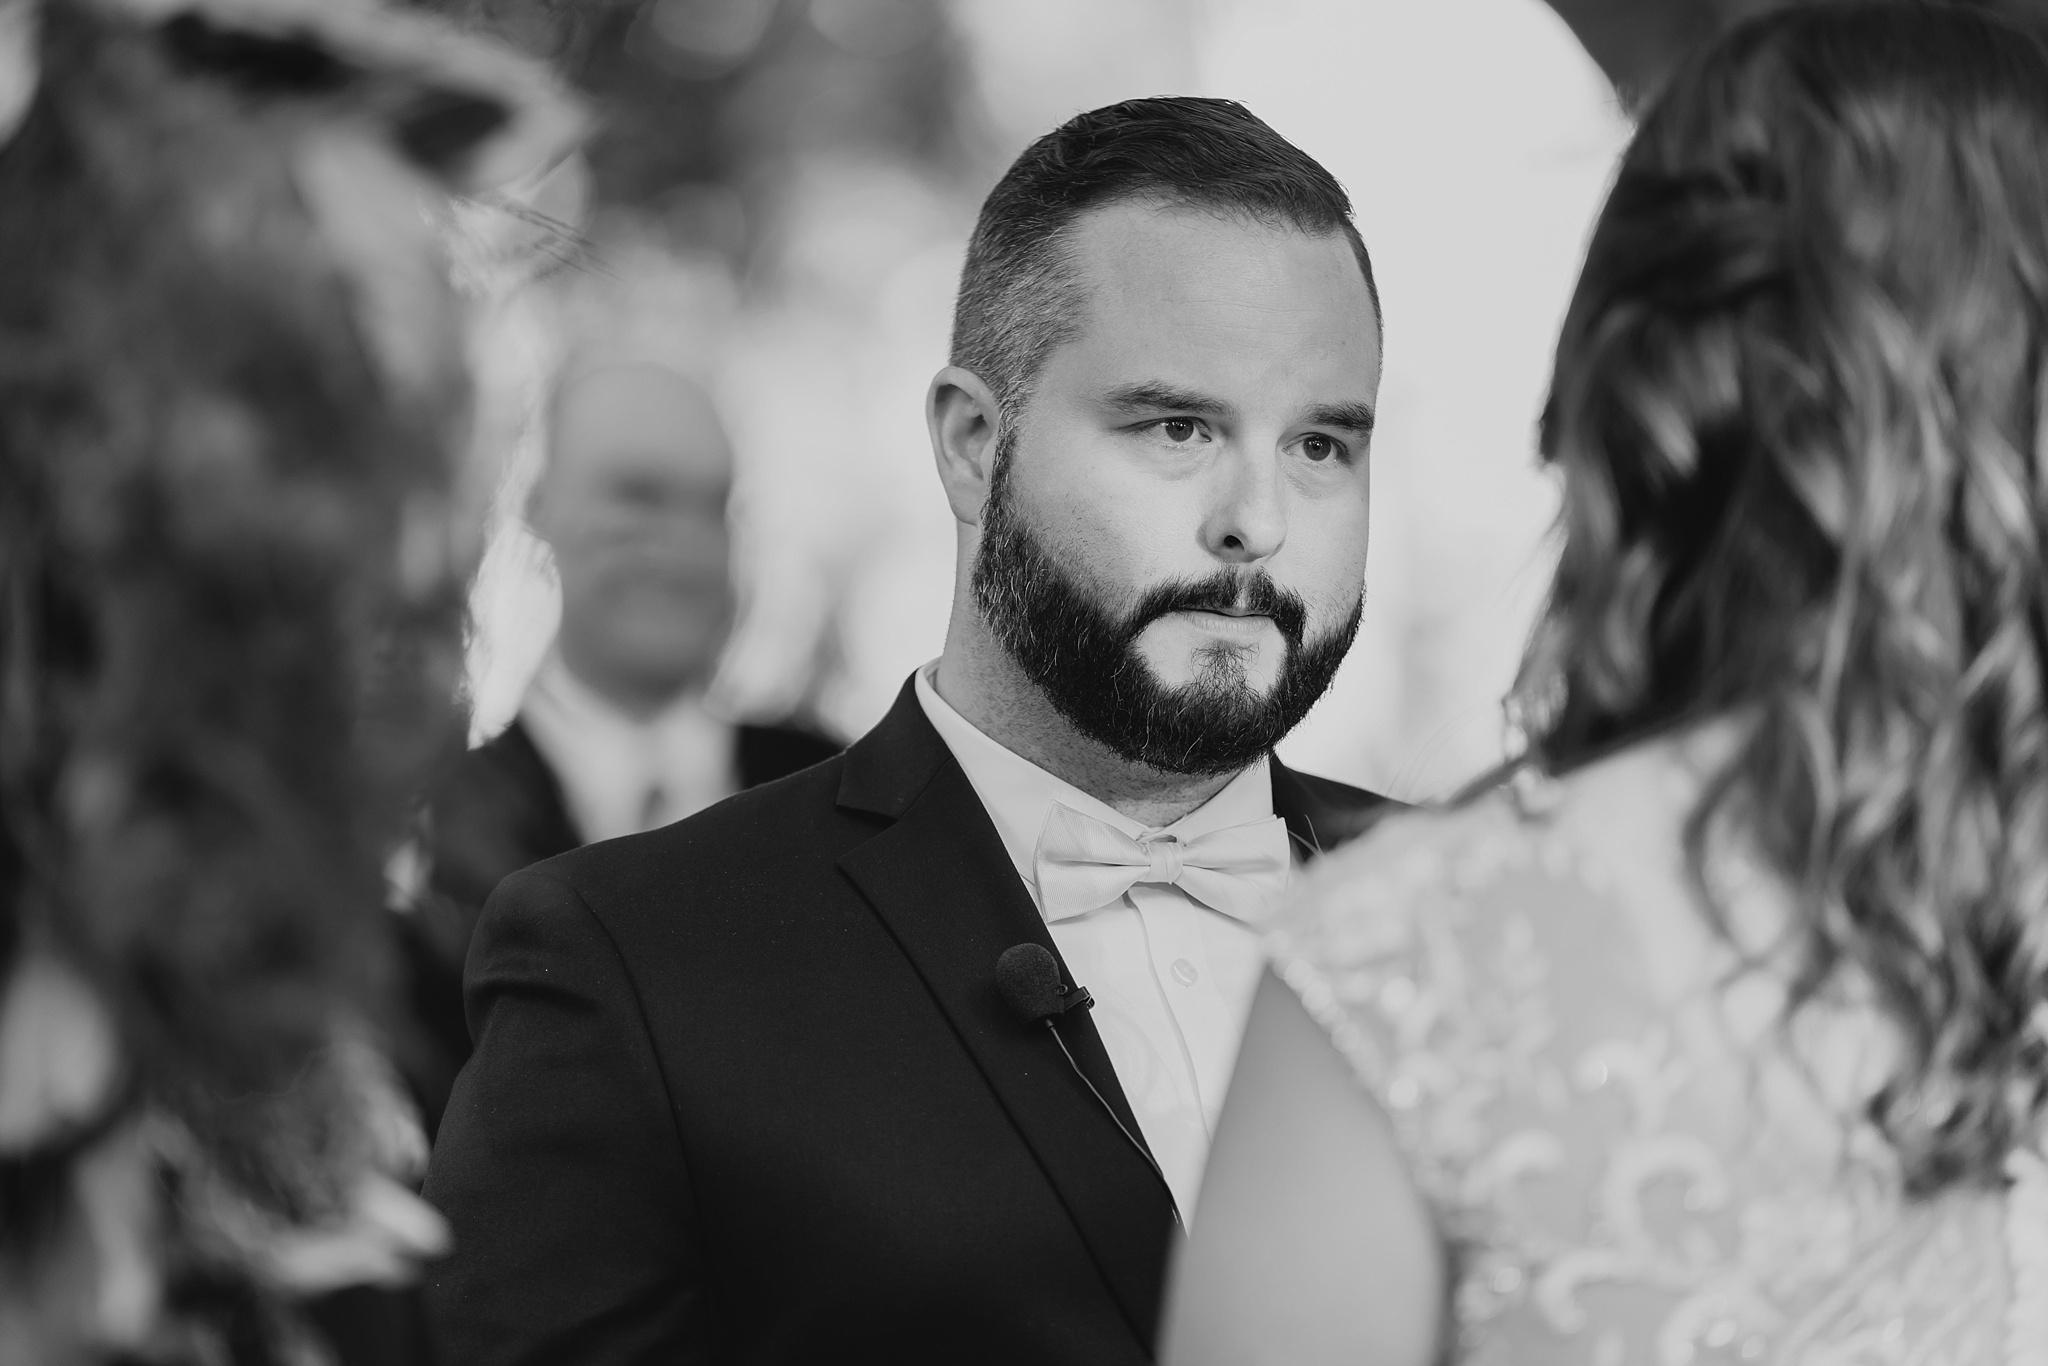 TommyandAmanda_WEDDING_BrienneMichelle_Ceremony_062_BLOG.jpg